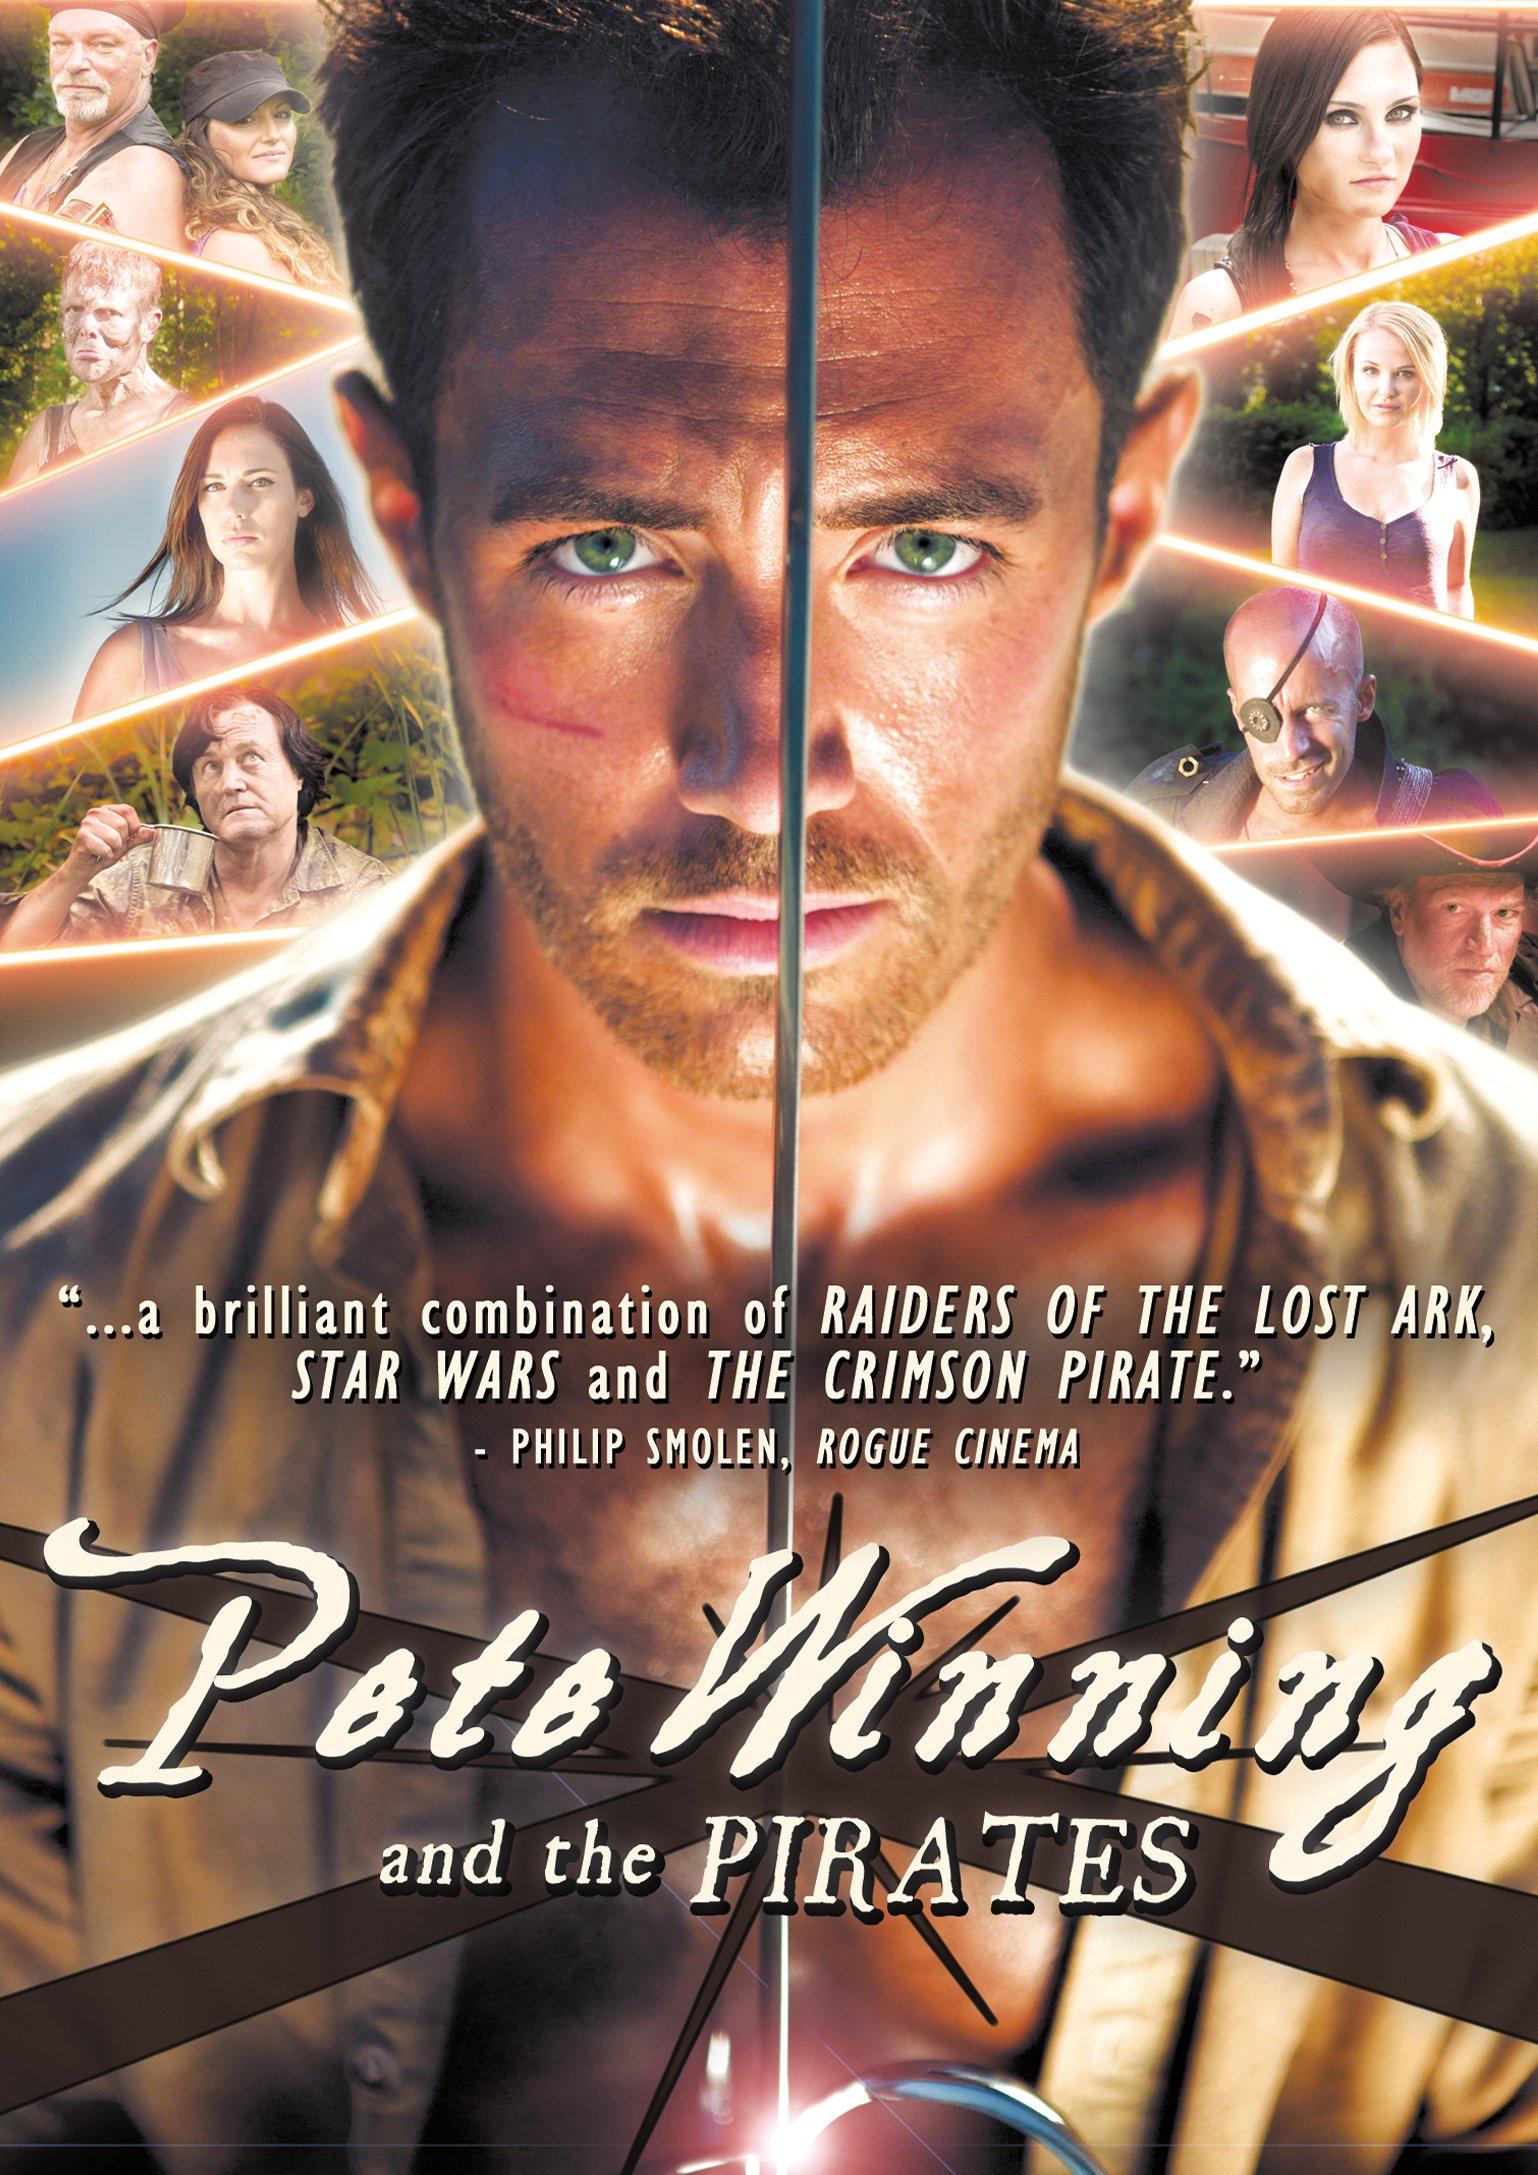 DVD : Pete Winning & The Pirates (DVD)